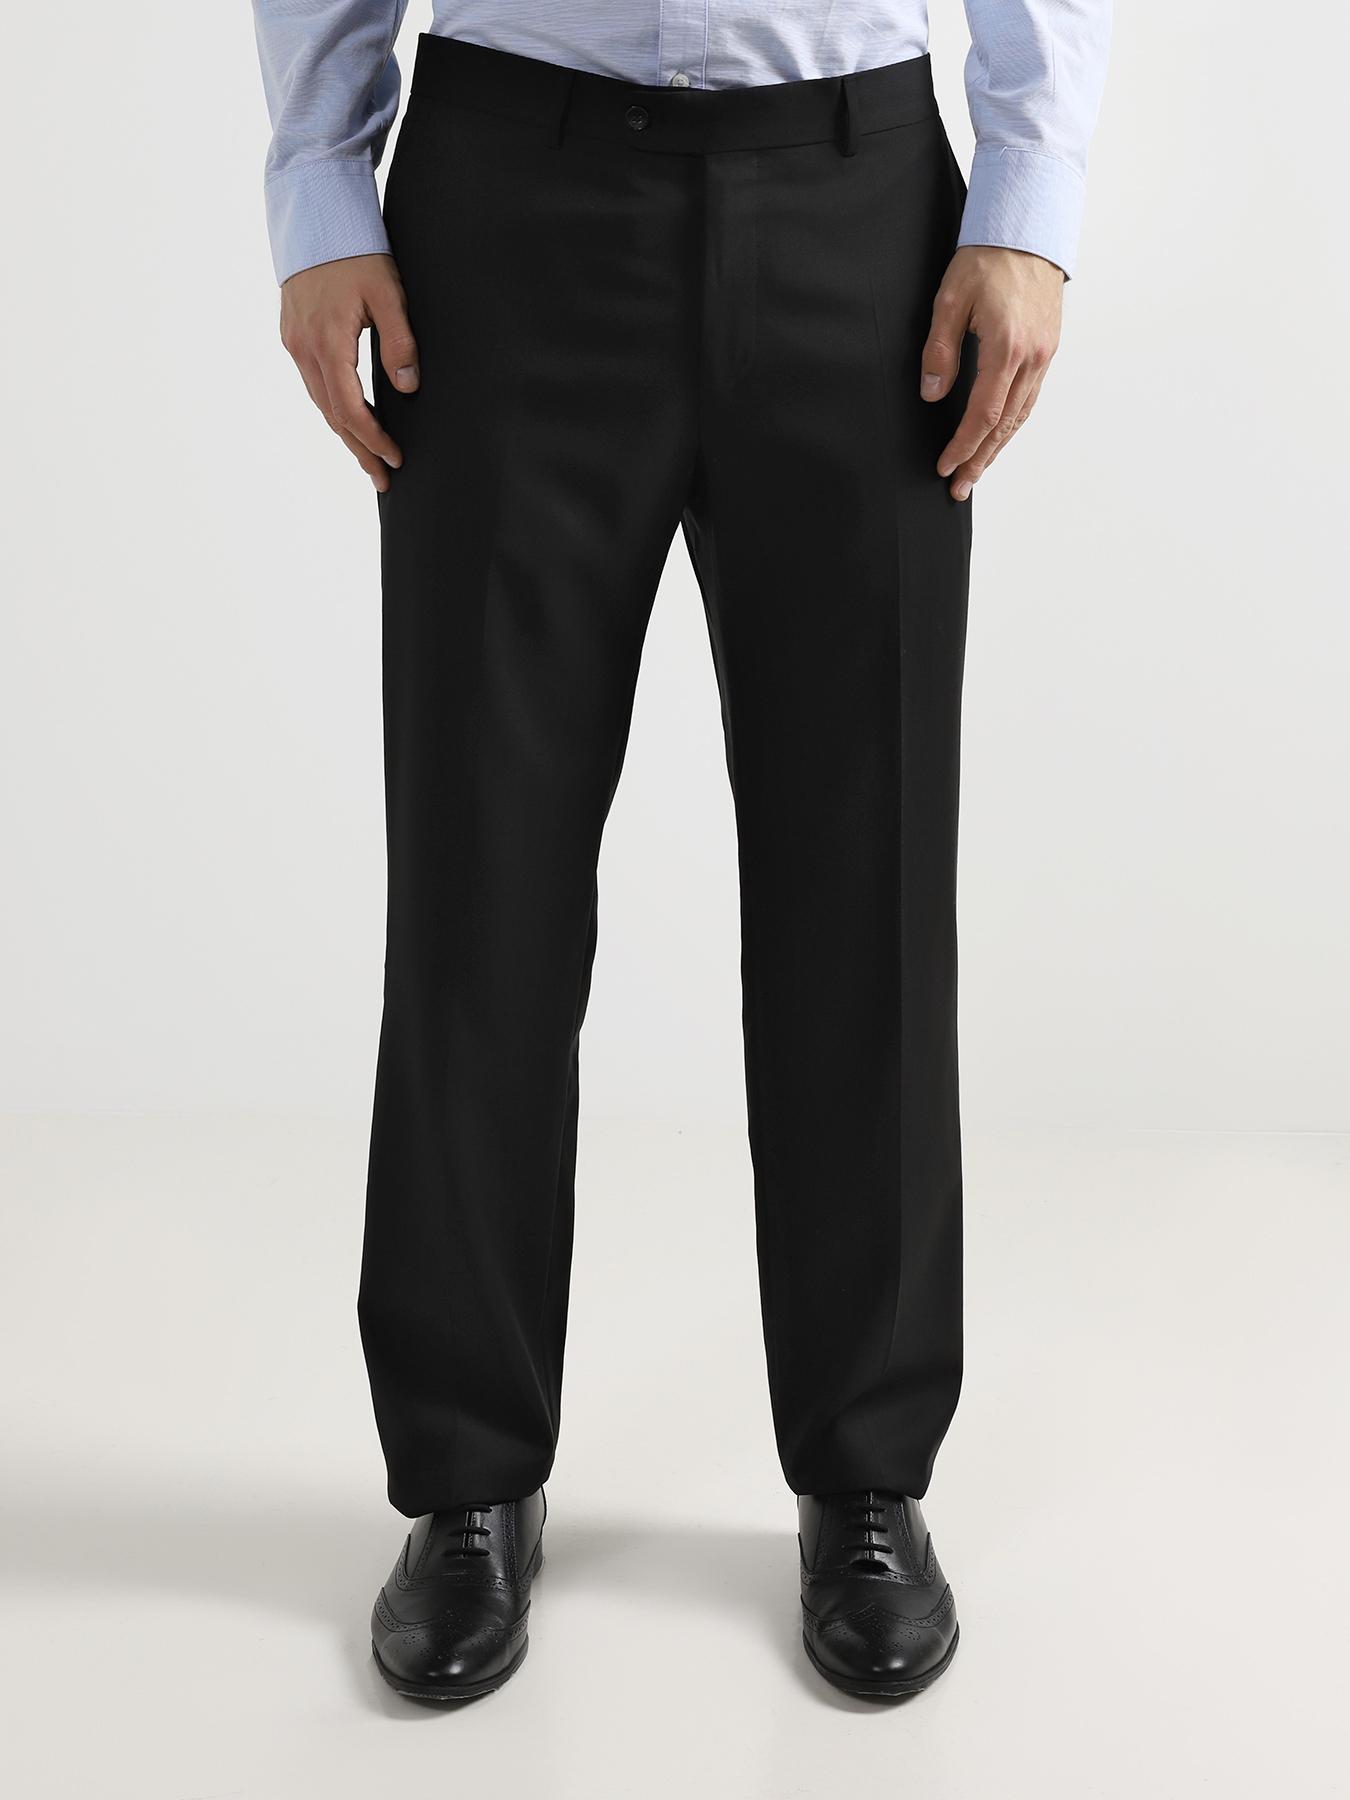 Брюки Ritter Классические брюки